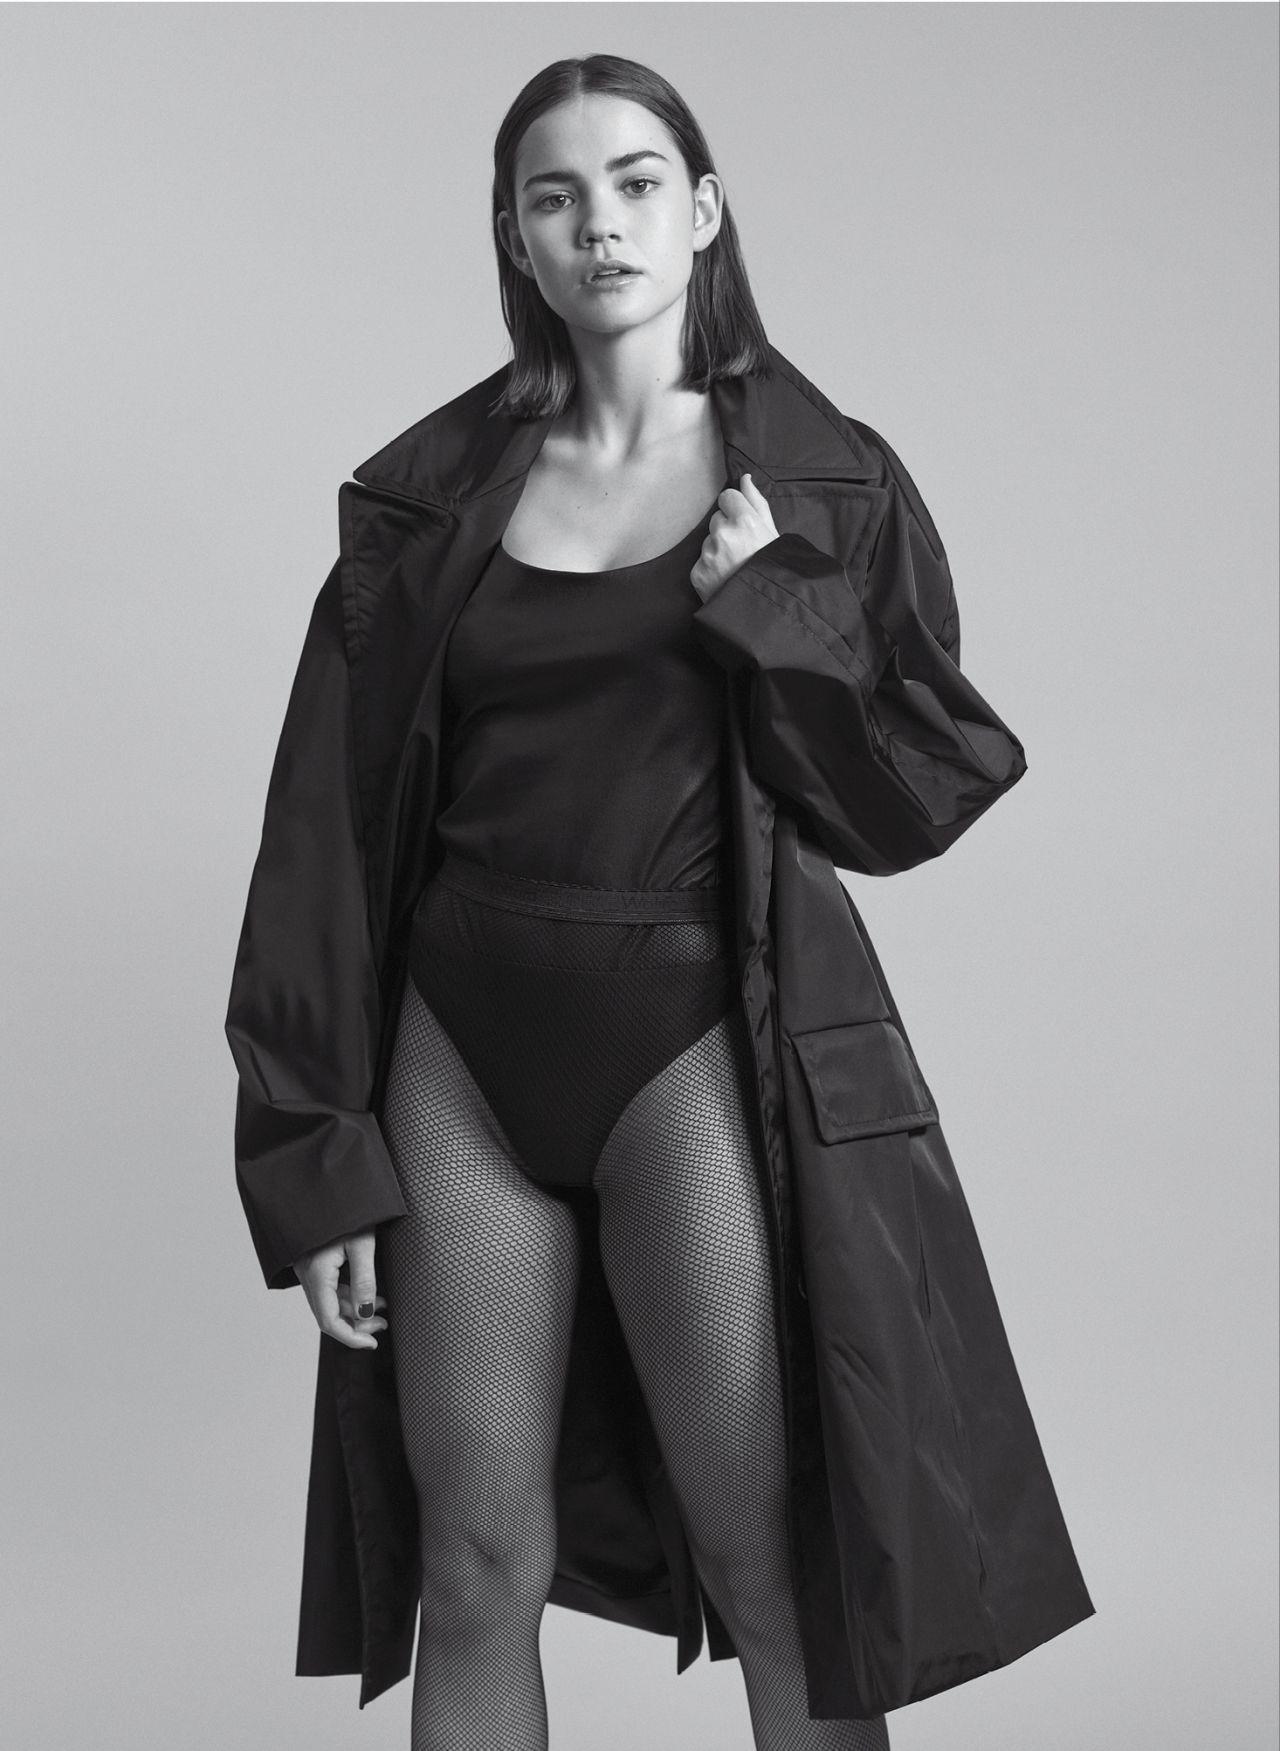 Maia Mitchell V Magazine 113 Summer 2018 Photoshoot